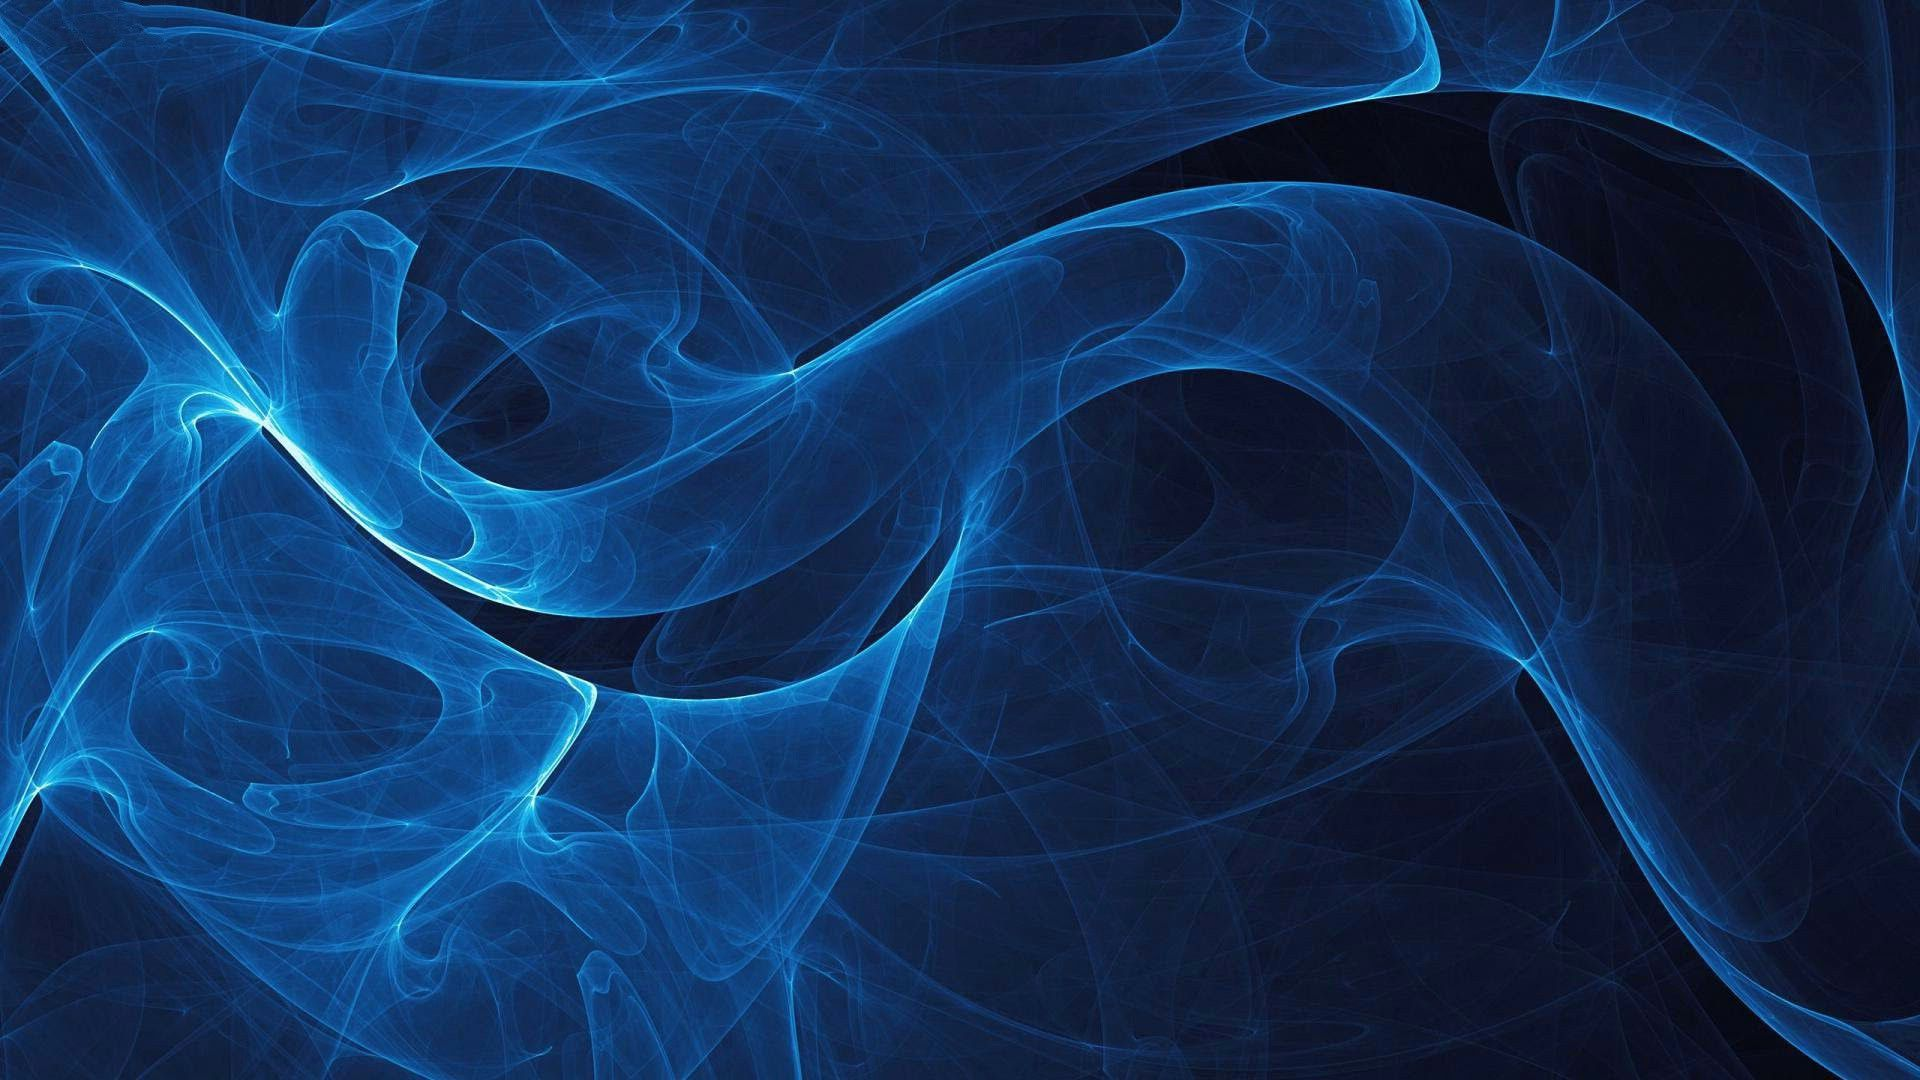 Joli Fond Ecran Avec Fond Ecran Abstrait Idees Et Fond Ecran Wallpaper Image Abstrait Bleu 09 Avec 1920x1080px Abstrait Fond Ecran Bleu Fond Ecran